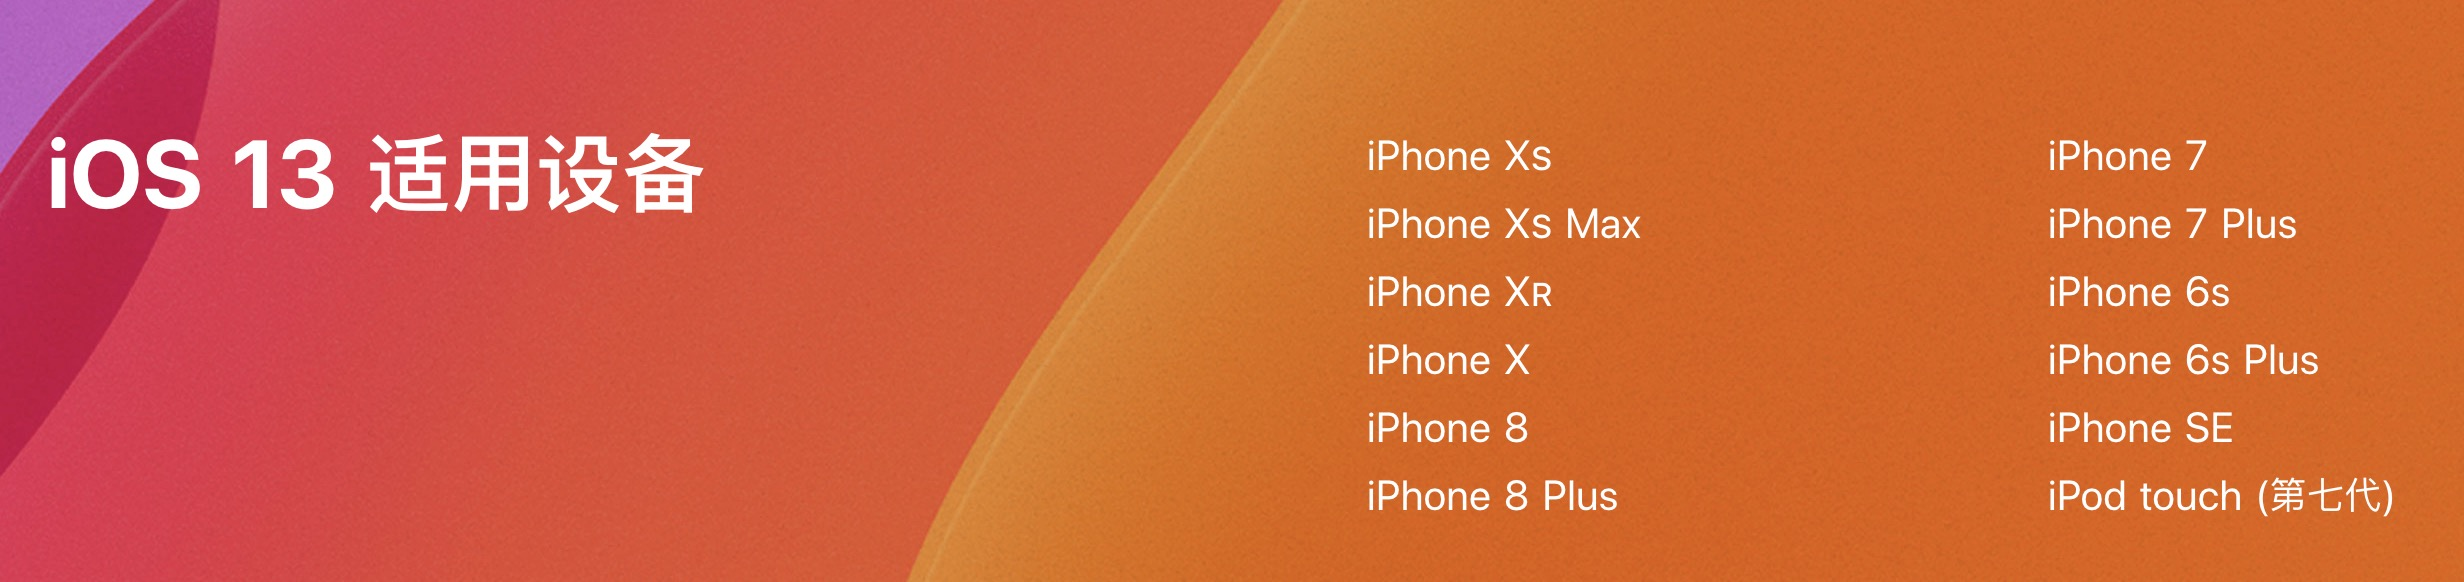 iOS13正式版来了,更新后快去试试这些新功能